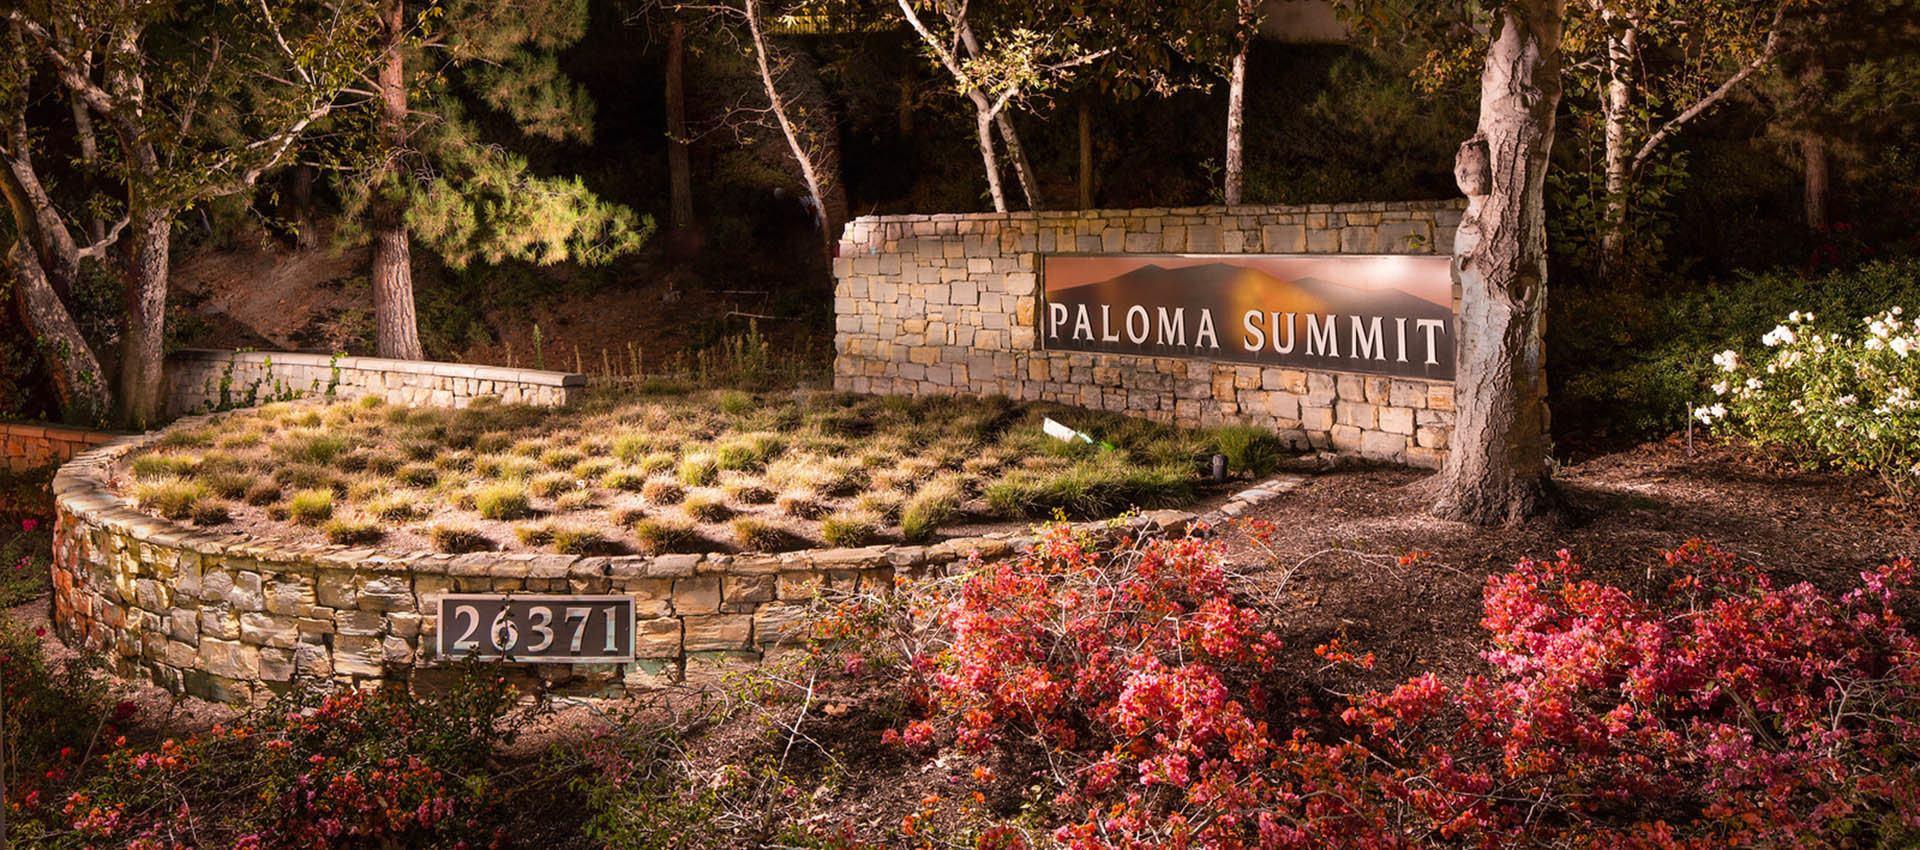 Signage at Paloma Summit Condominium Rentals in Foothill Ranch, CA